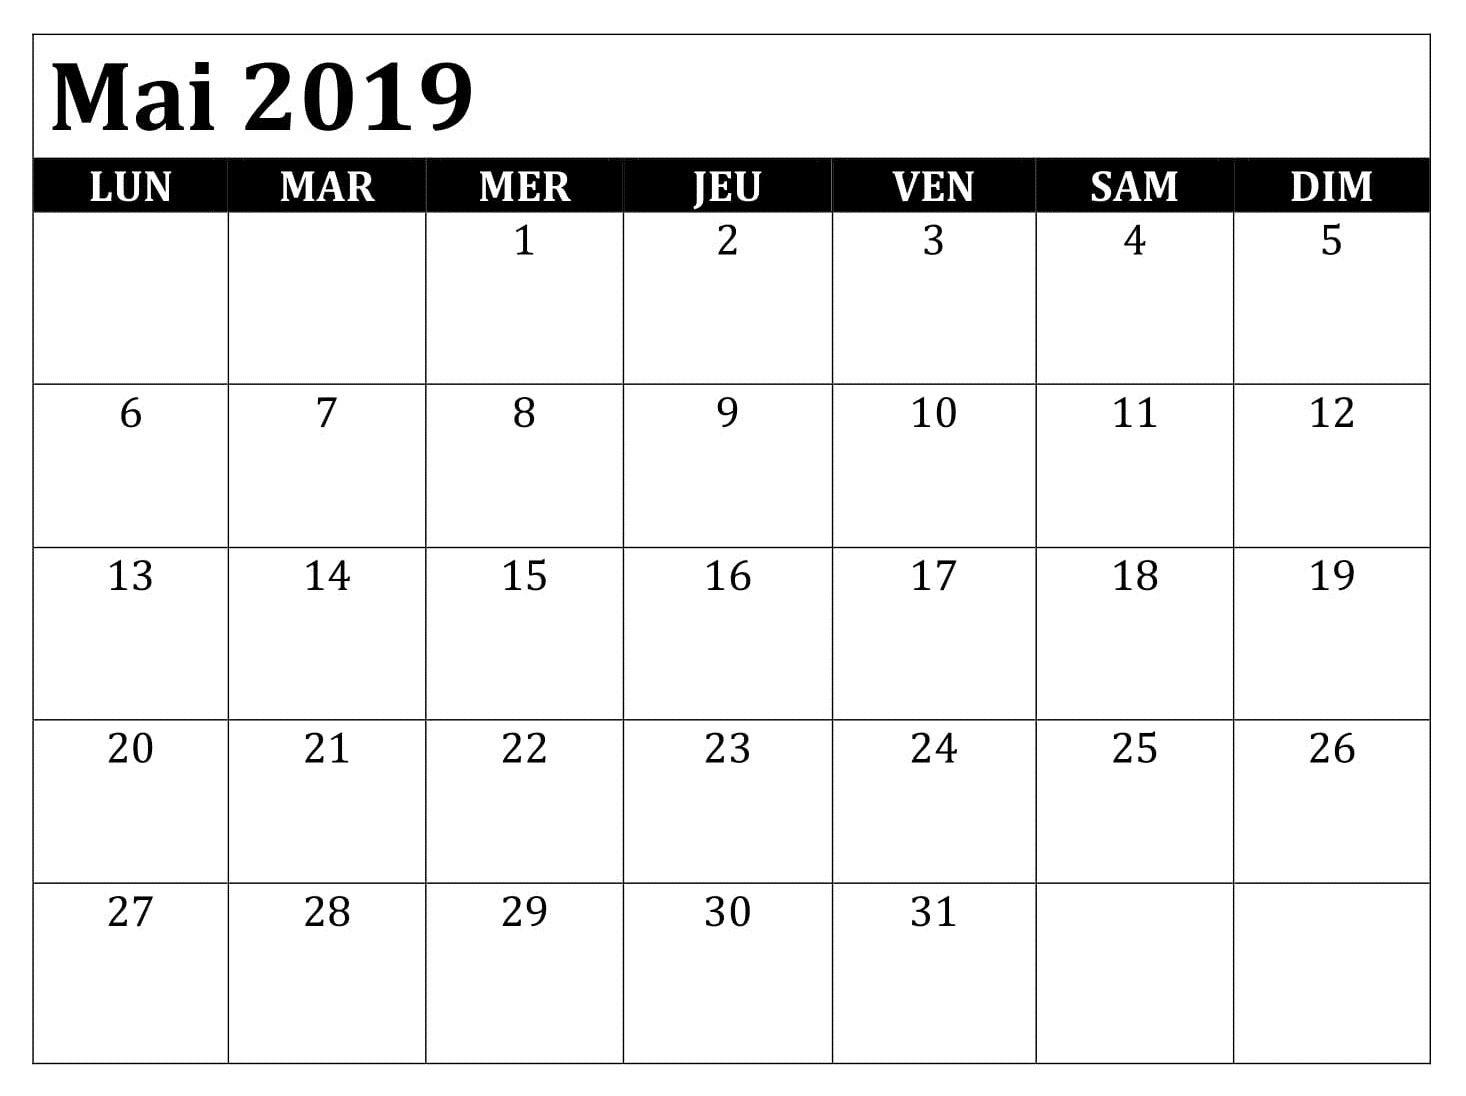 Calendrier Mai2019.Calendrier Mai 2019 Avec Jours Feries Mai Mai2019